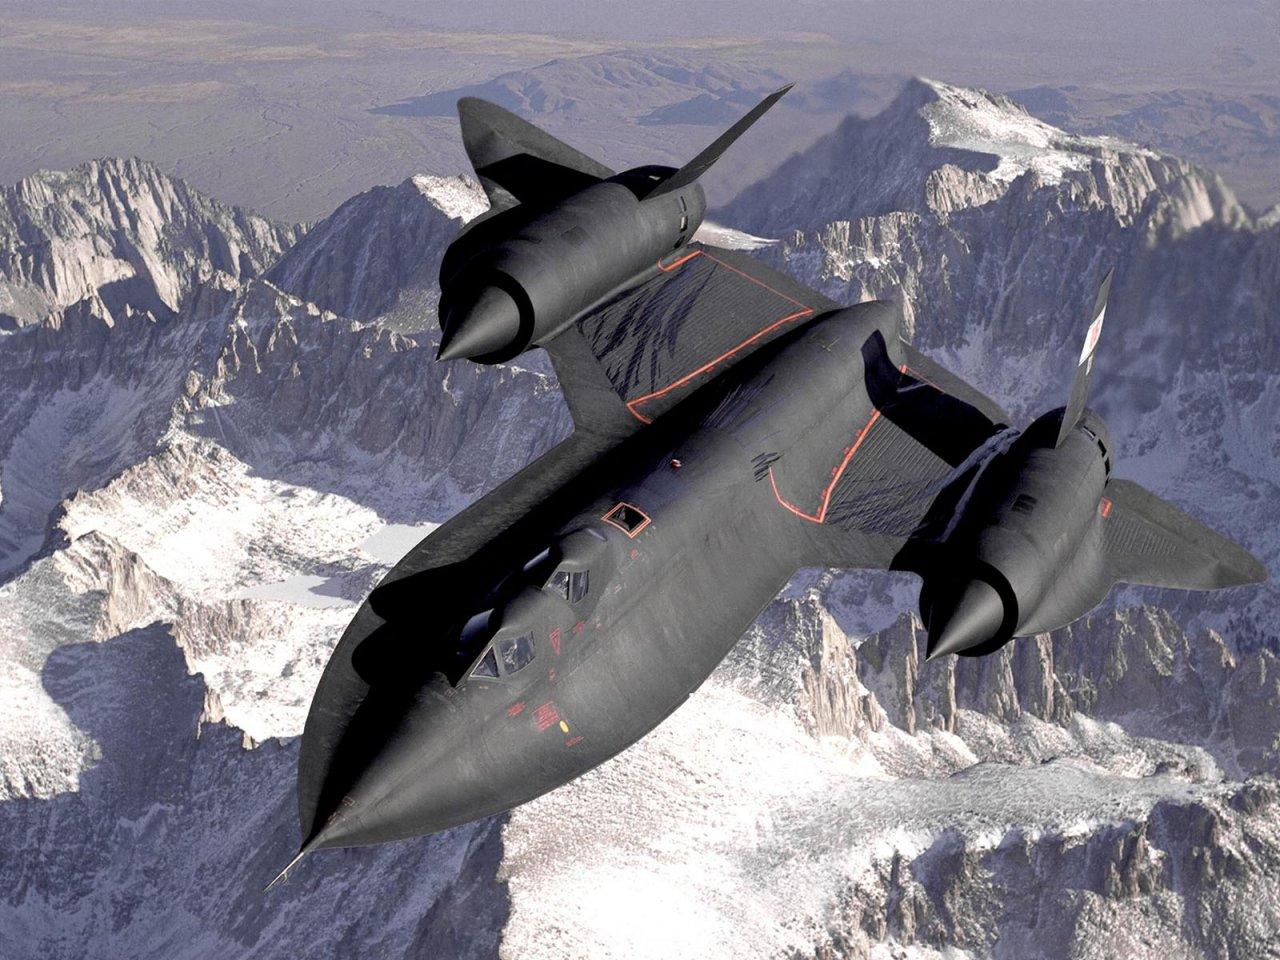 http://infoglaz.ru/wp-content/uploads/lockheed-sr-71-blackbird-strategic-reconnaissance-1280x960.jpg